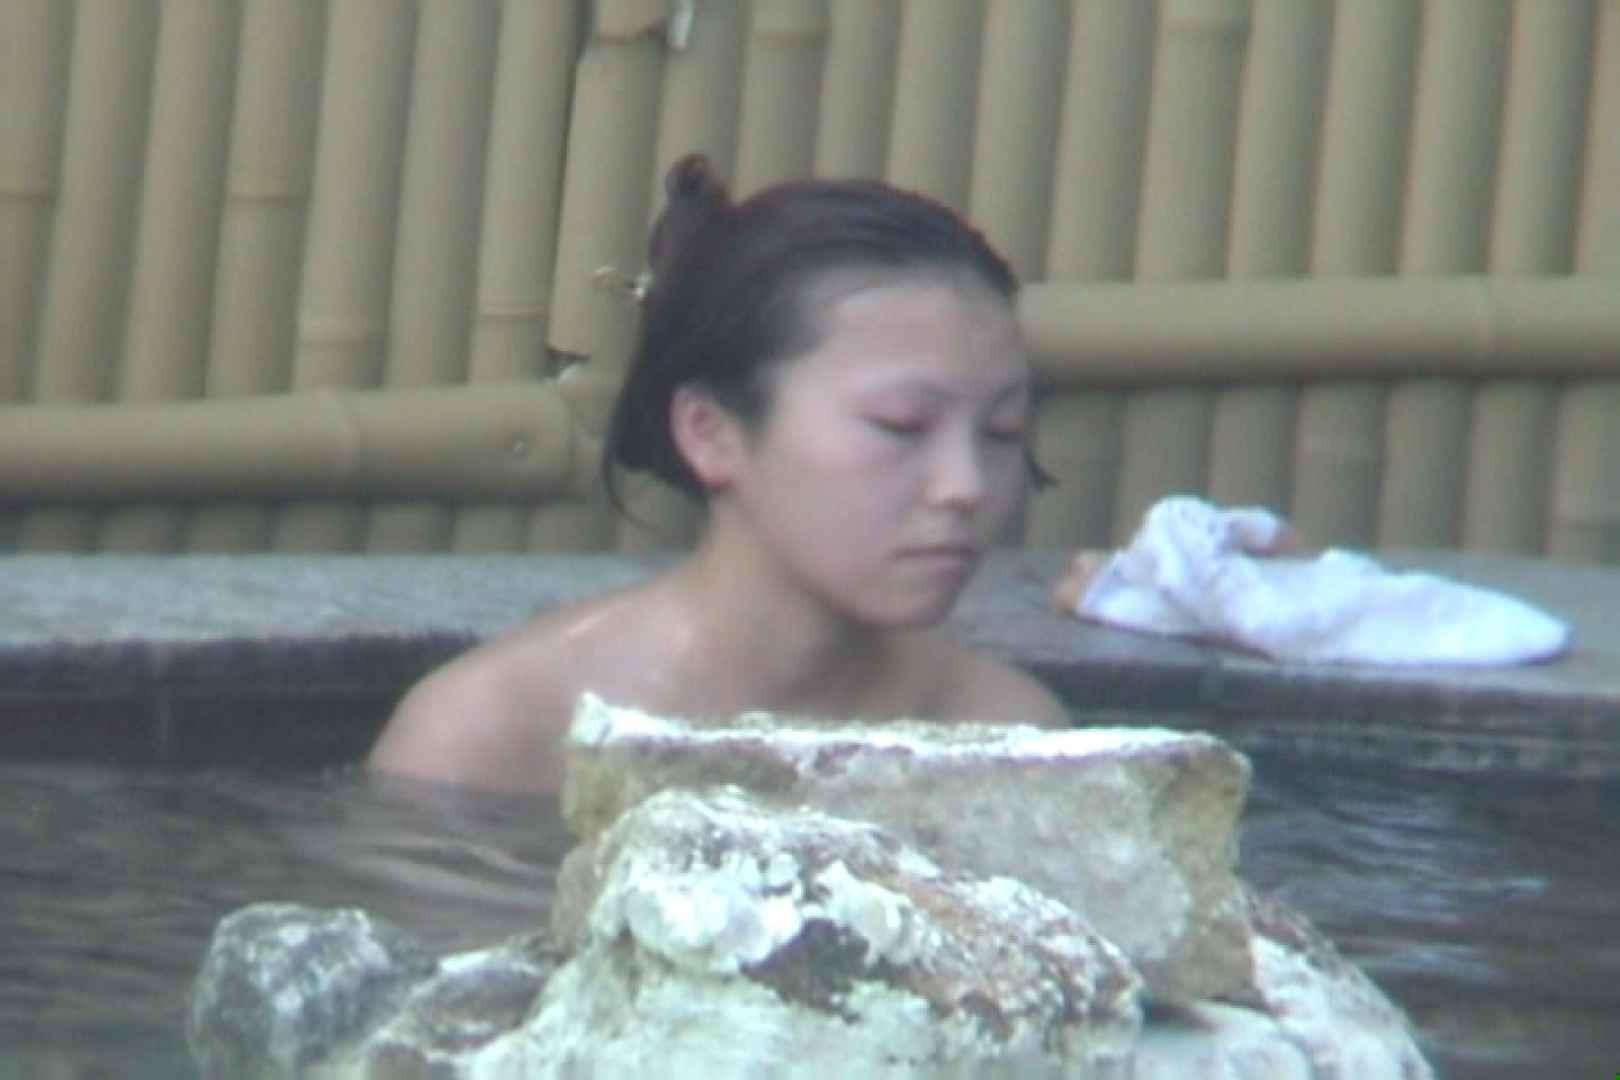 Aquaな露天風呂Vol.572 盗撮 | OLエロ画像  67PICs 7